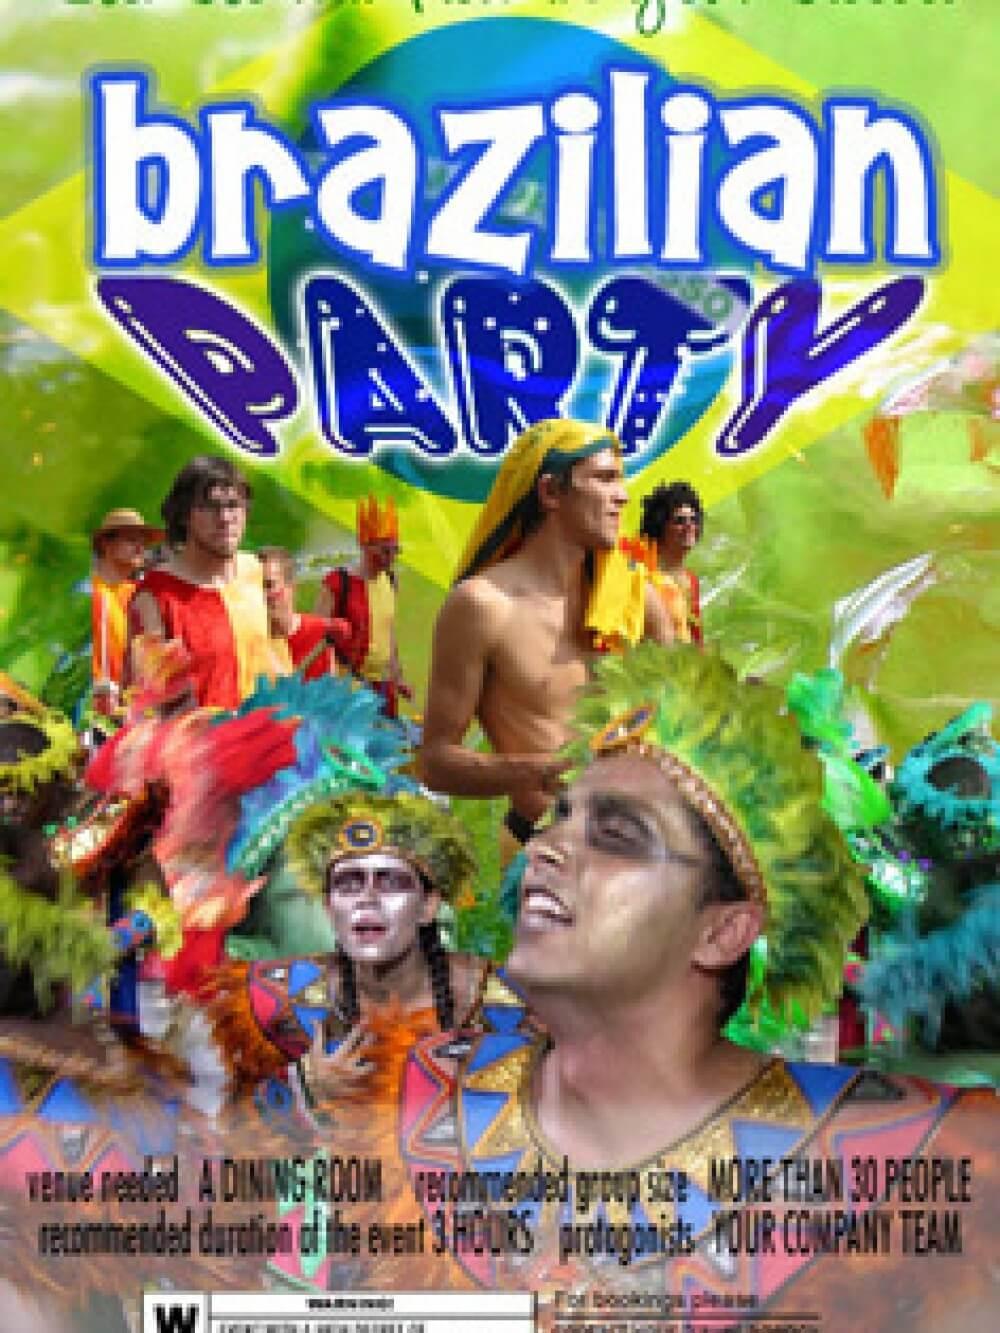 brazilian_party_vertical_web